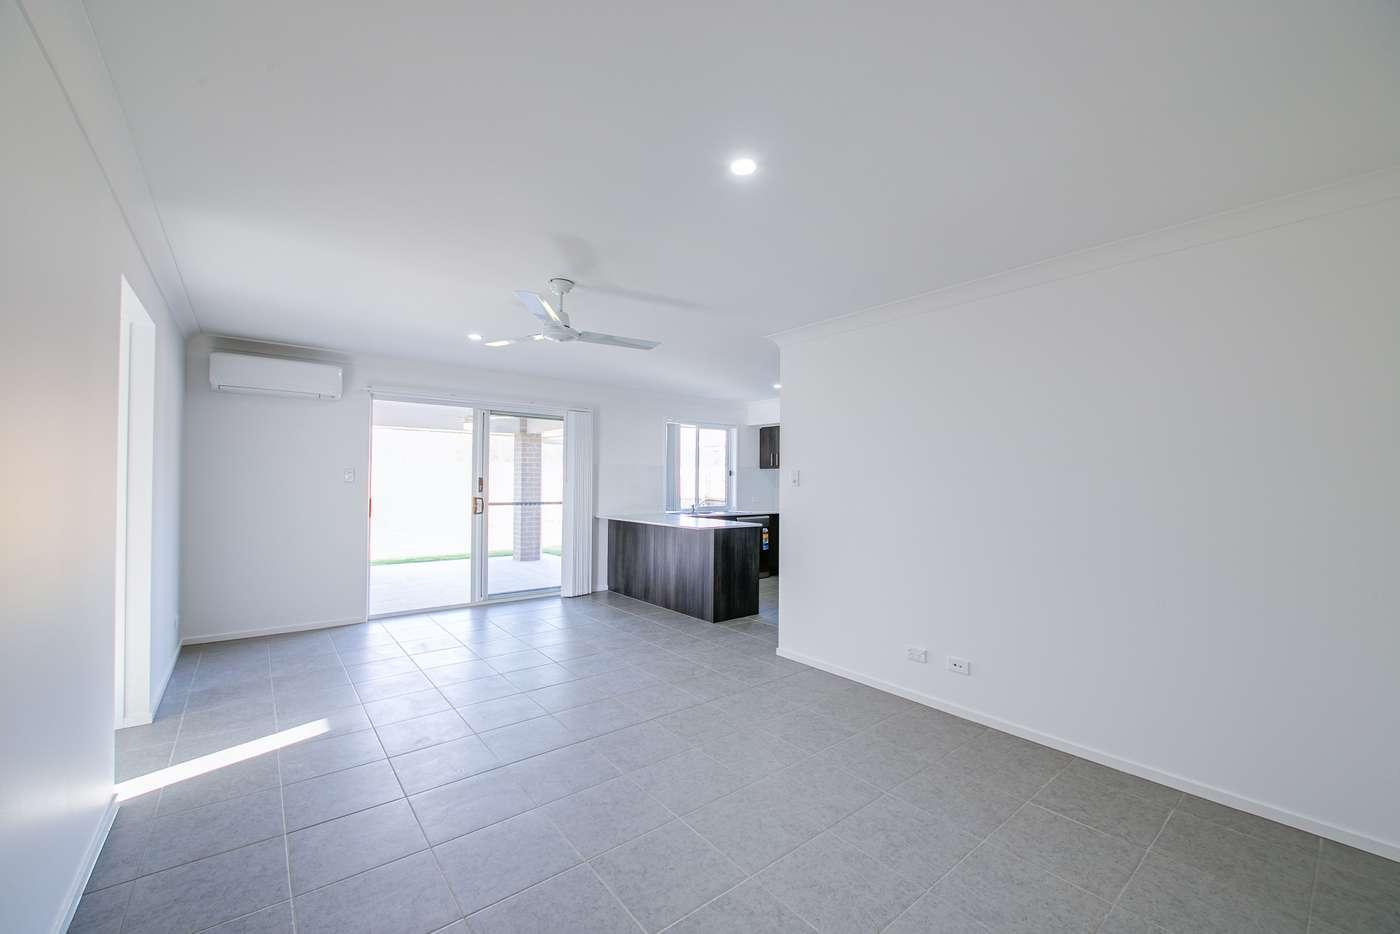 Sixth view of Homely house listing, 55 Mackellar Way, Walloon QLD 4306